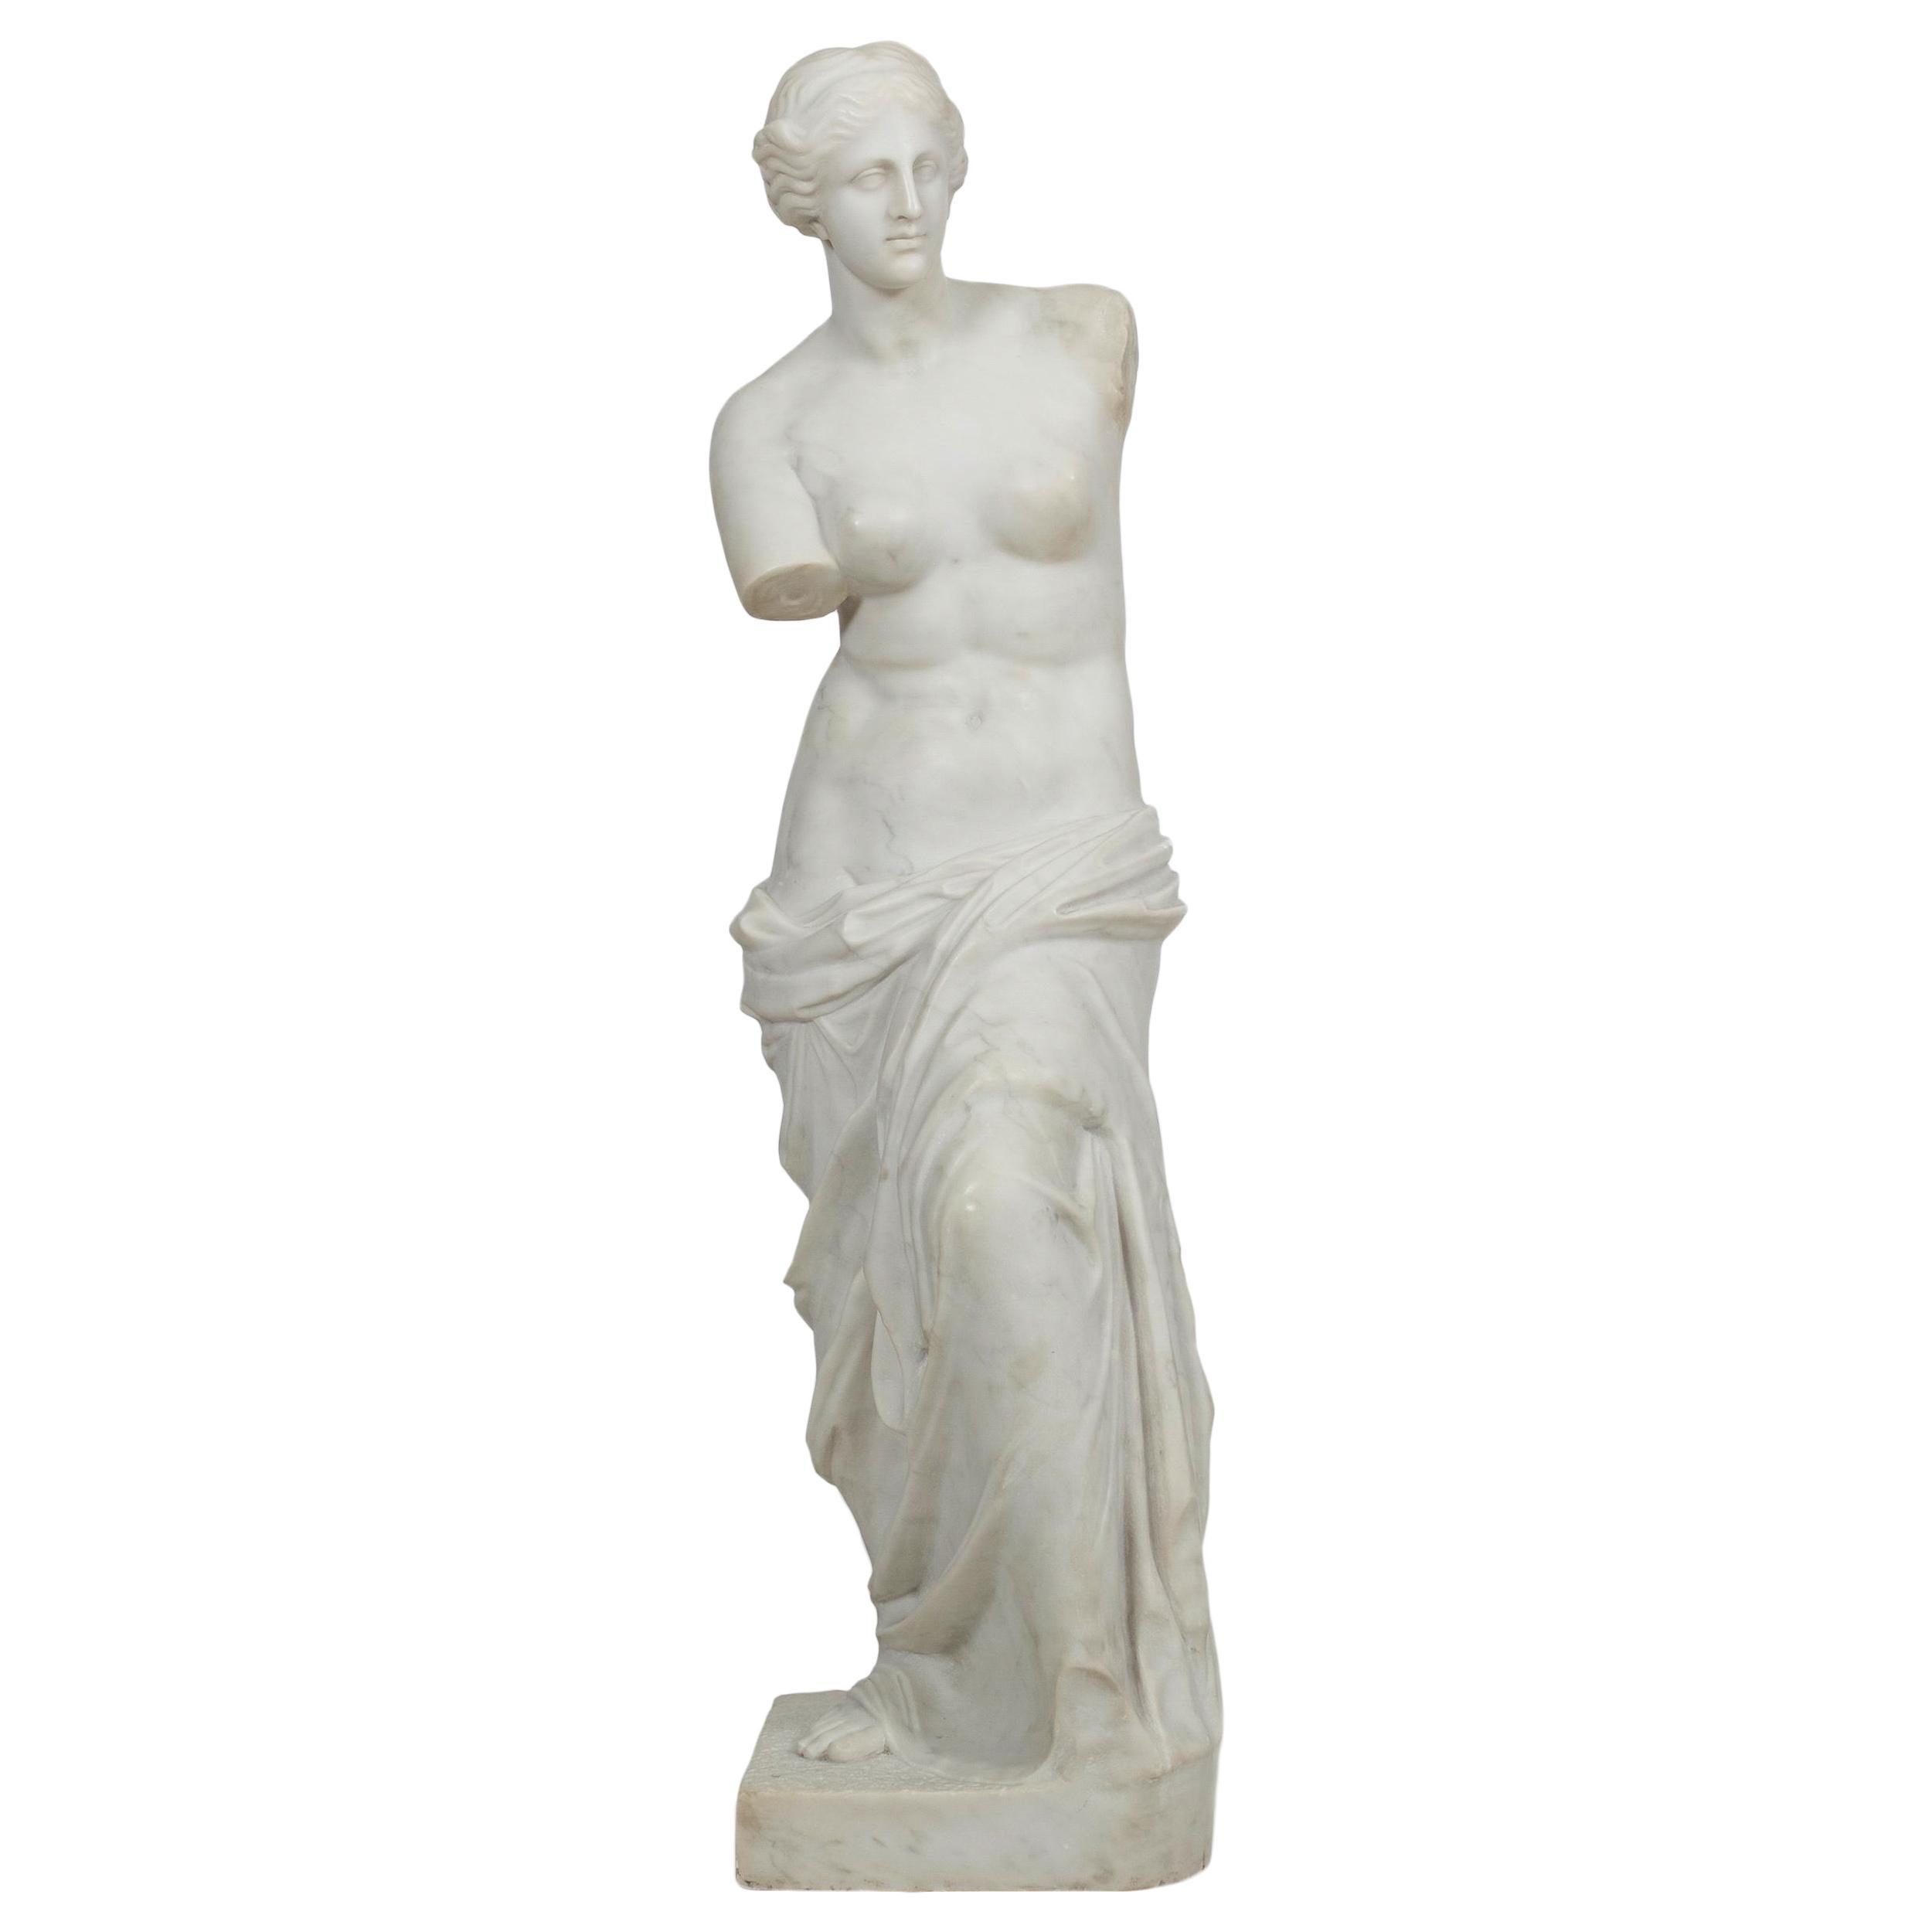 "Classical Antique Marble Sculpture of Statue ""Venus de Milo"""